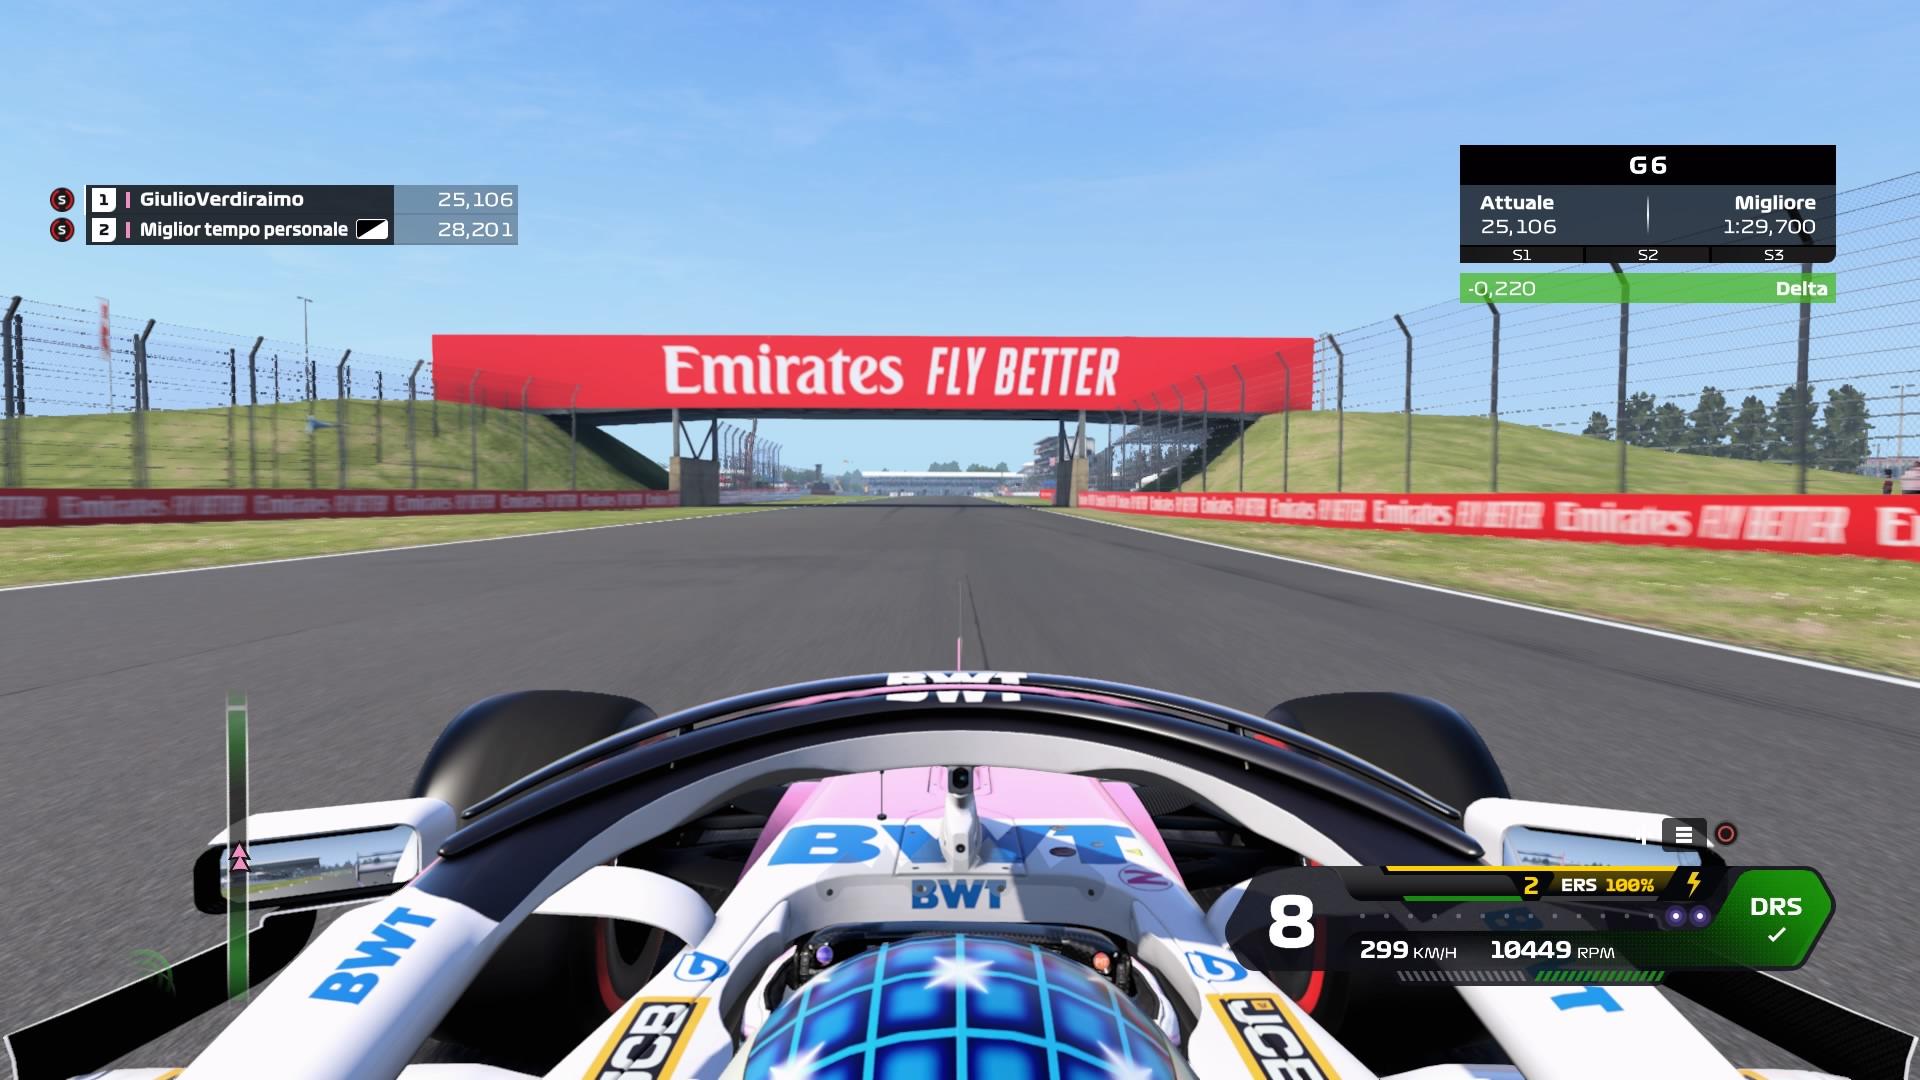 F1 2020 performance